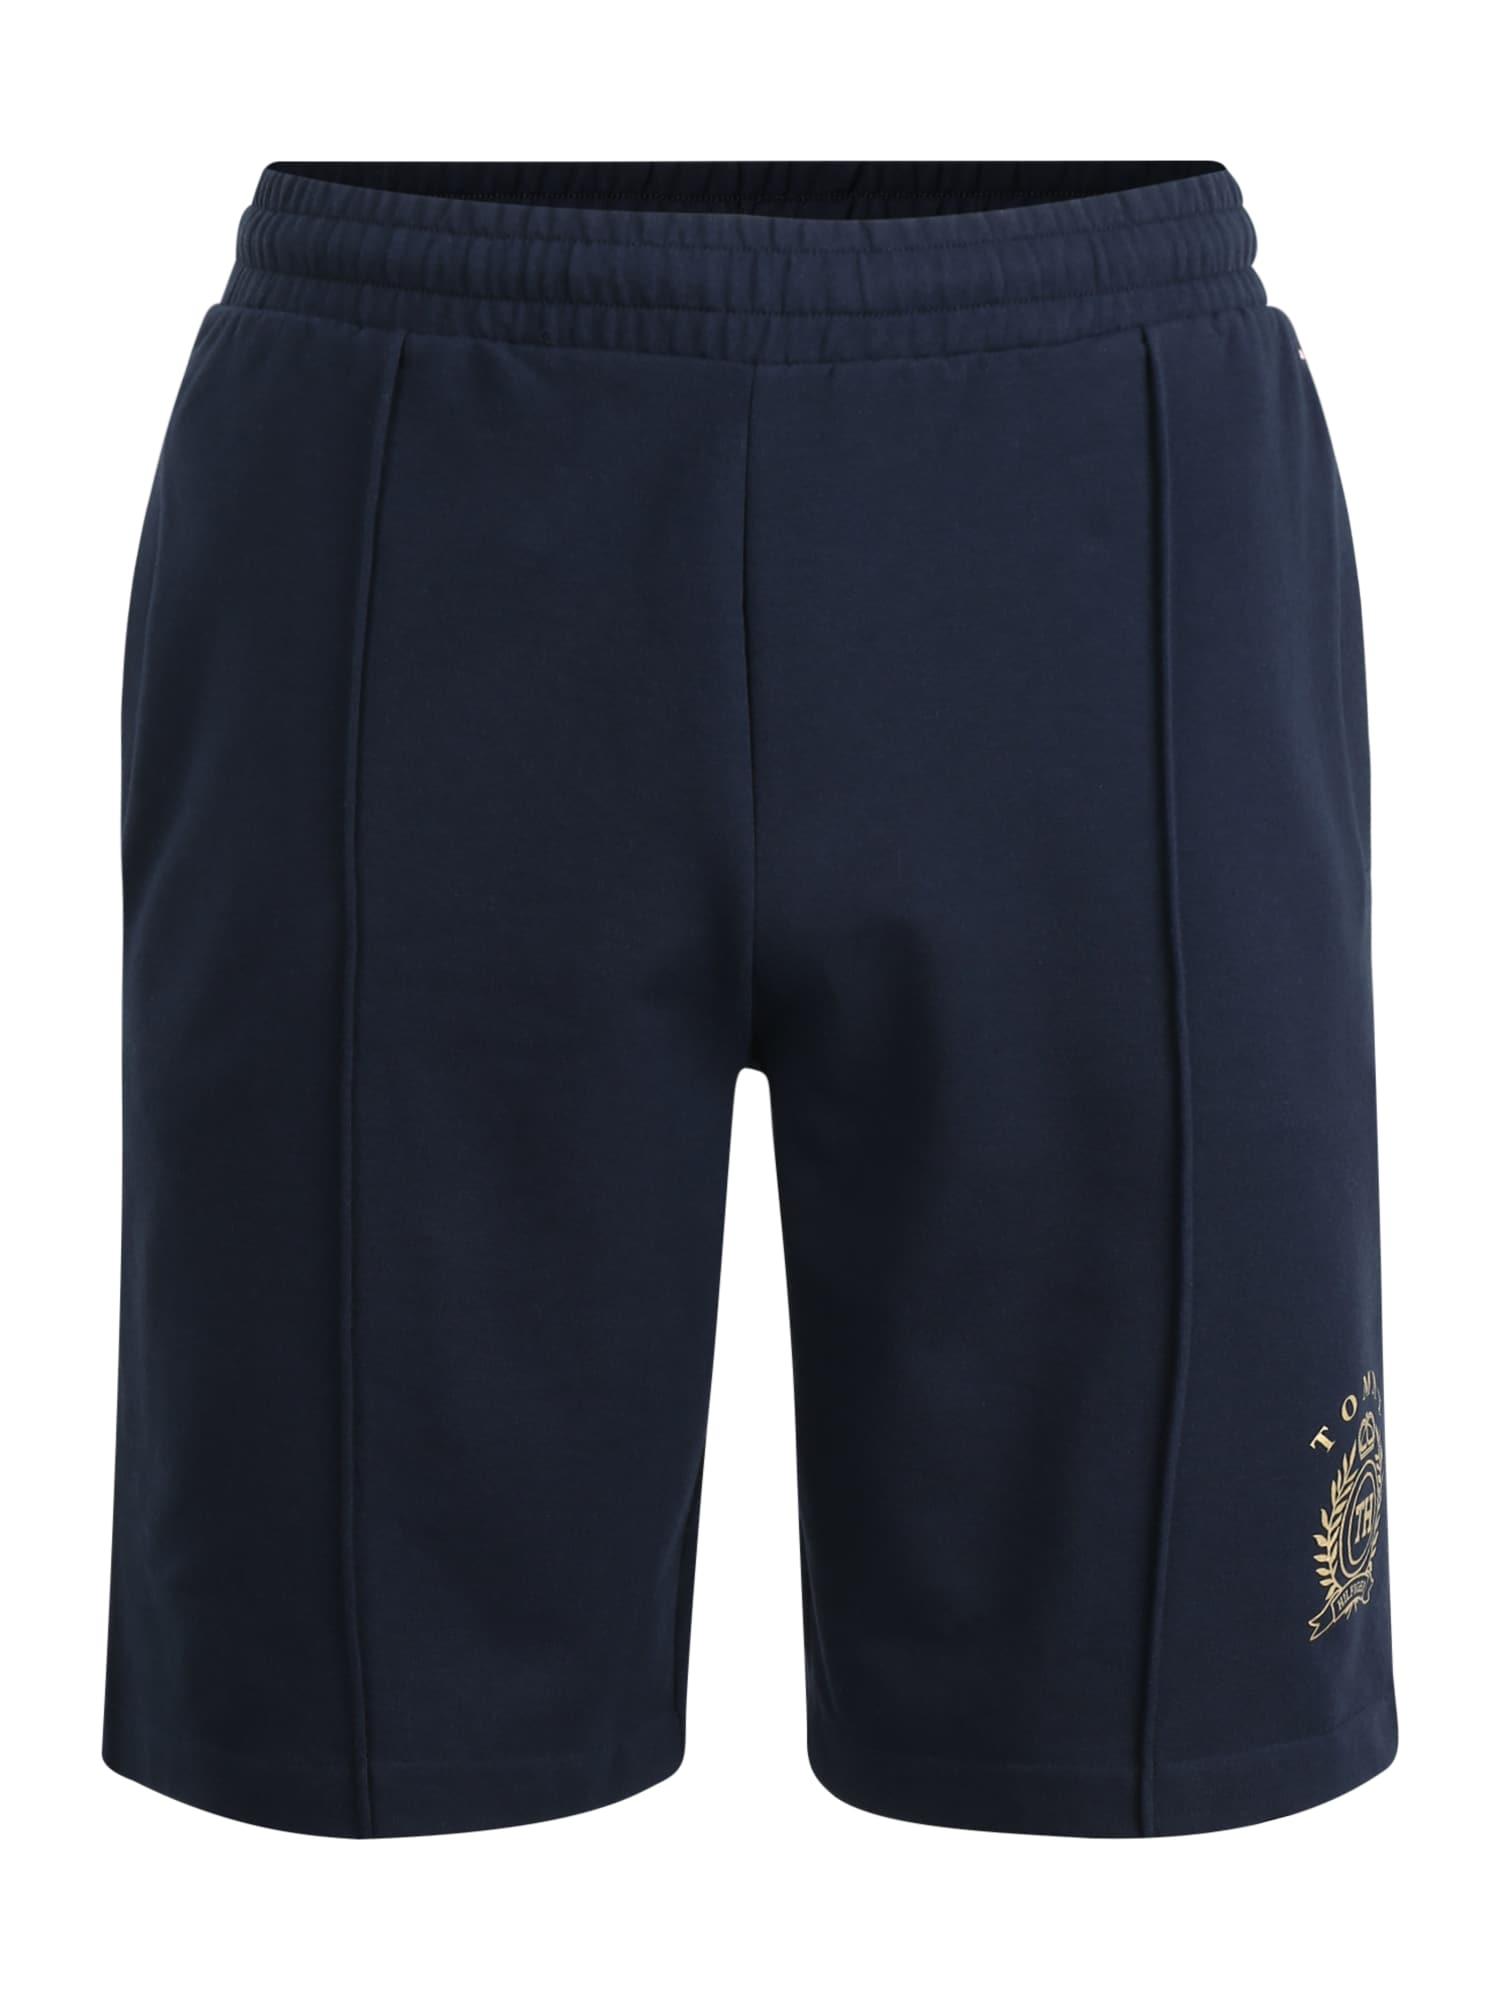 Tommy Hilfiger Underwear Trumpa pižama tamsiai mėlyna